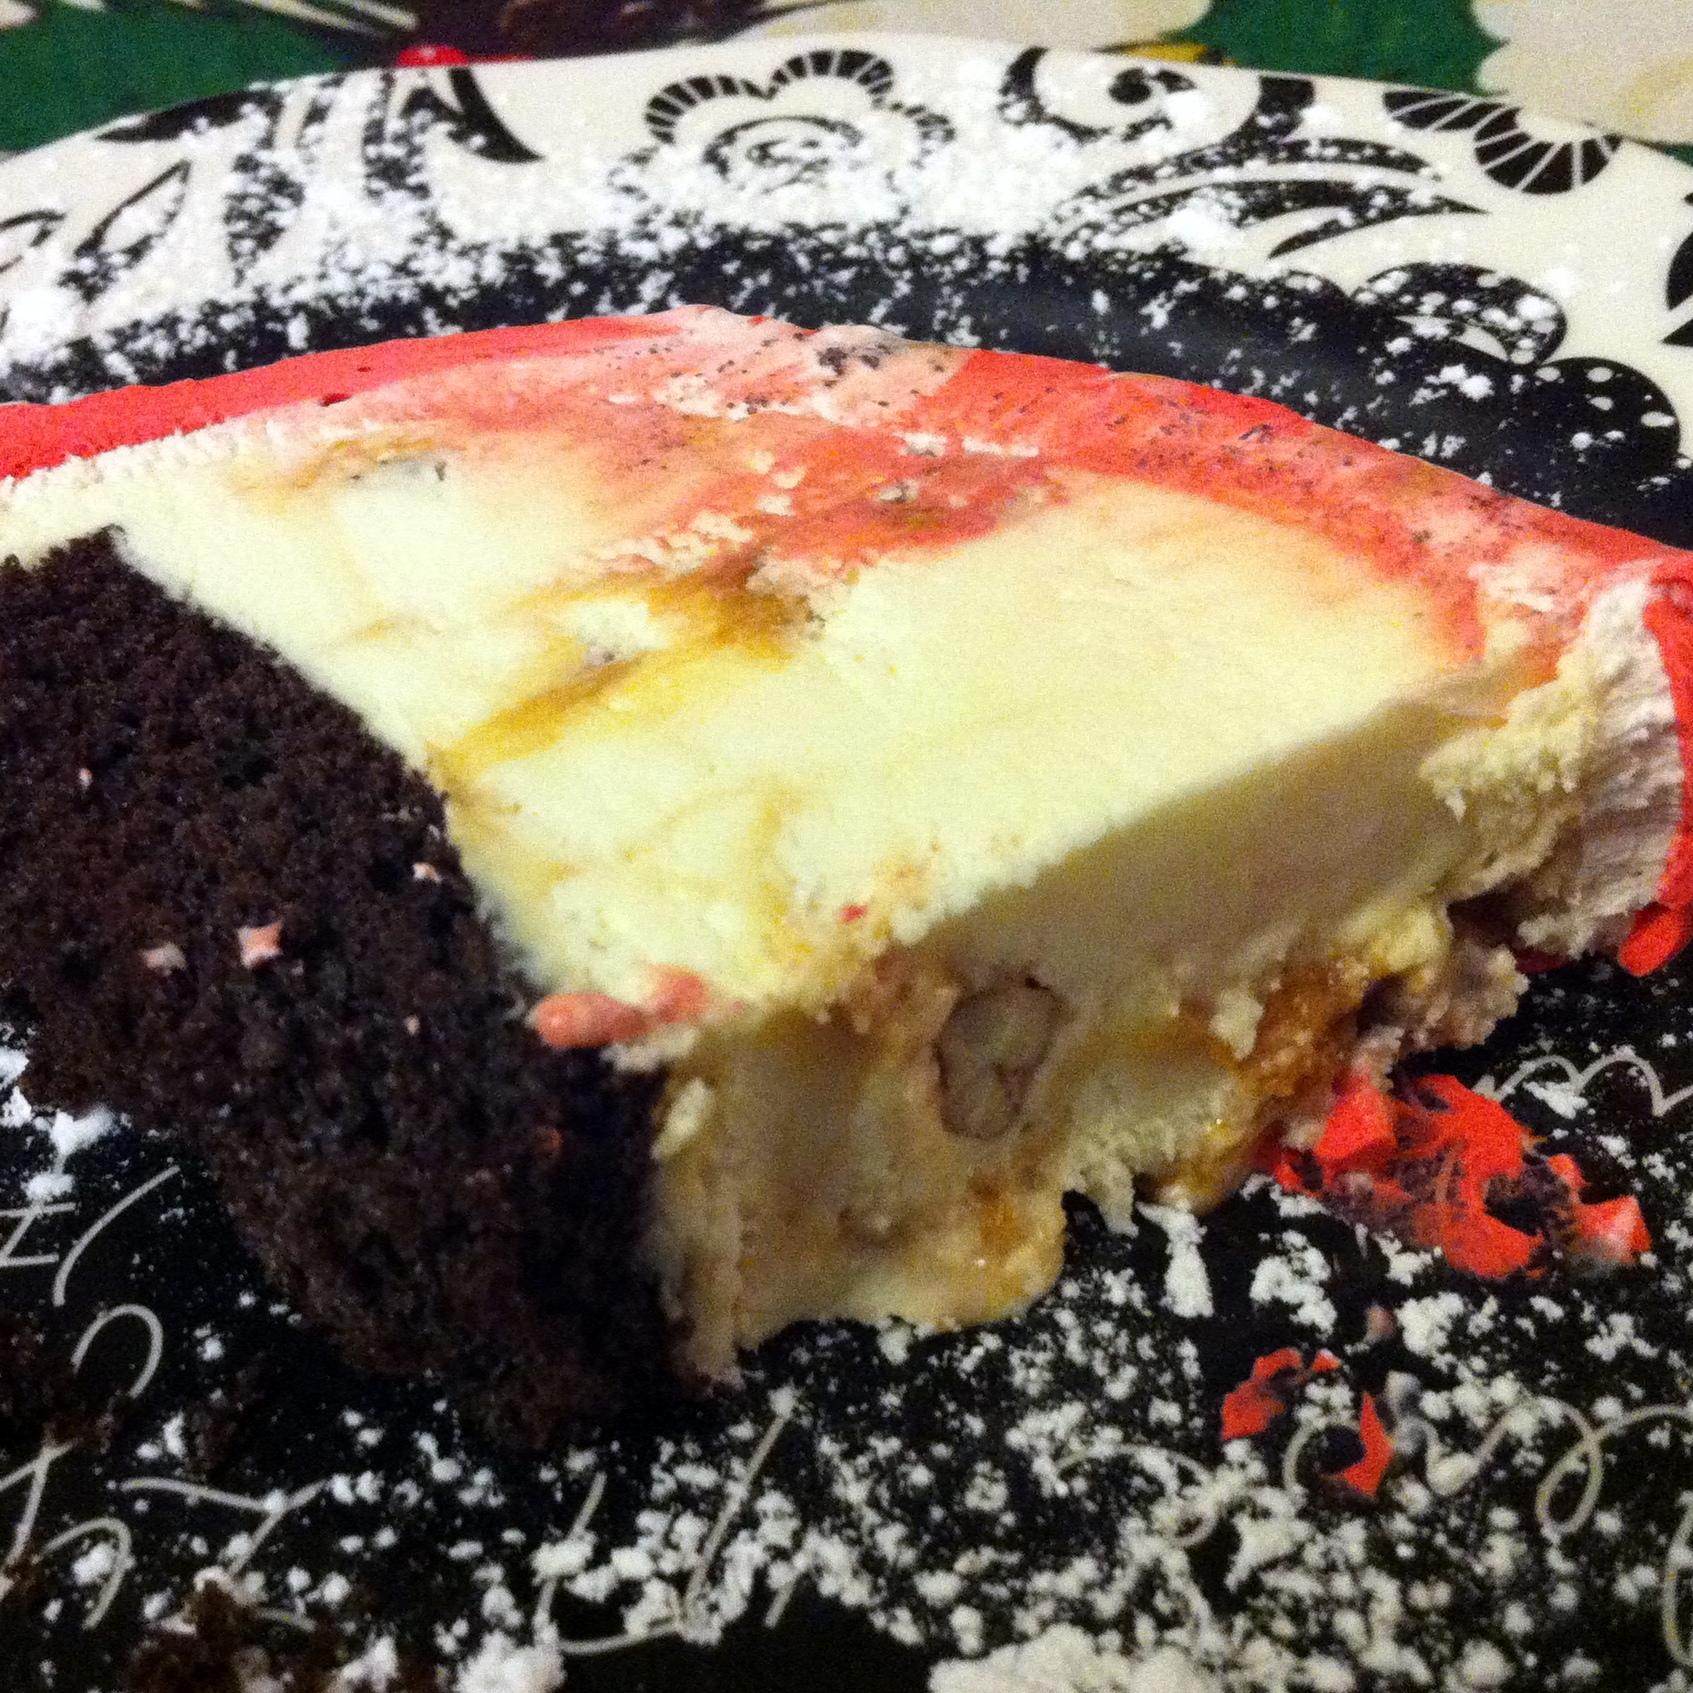 praline ce cream cake